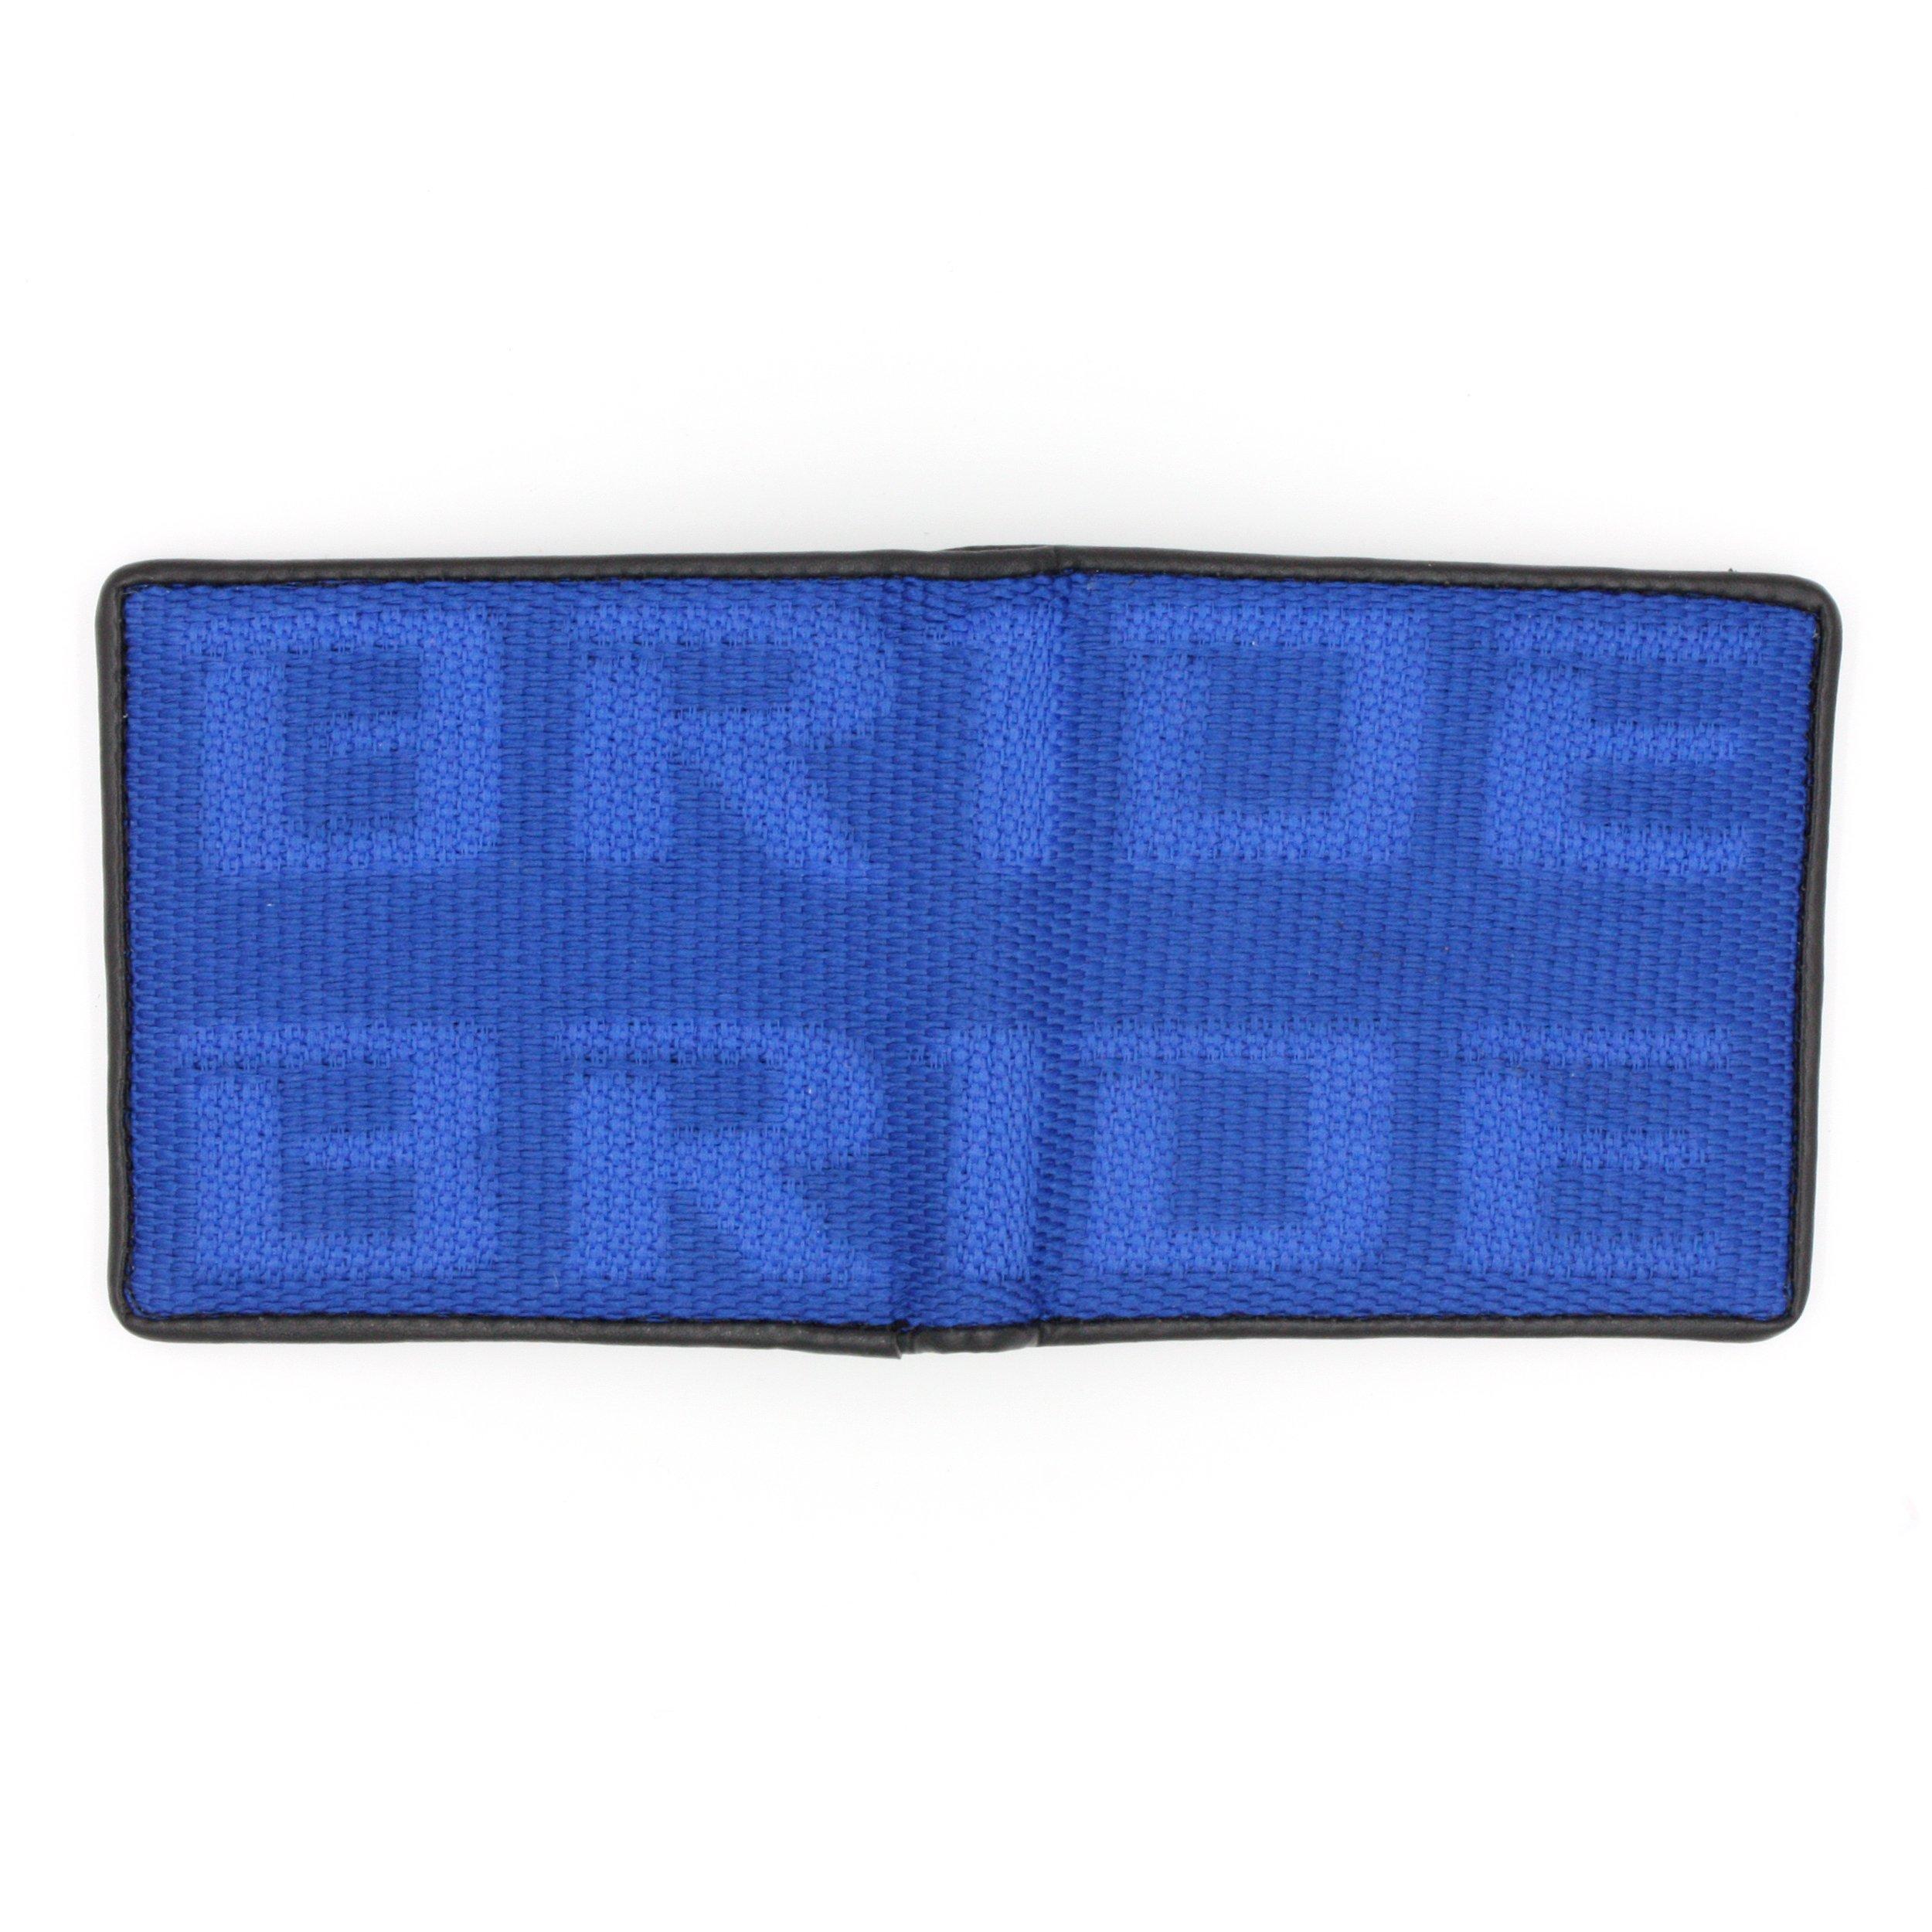 Kei Project Bride Racing Wallet Seat Fabric Leather Bi-fold Gradation (Bride-Blue)